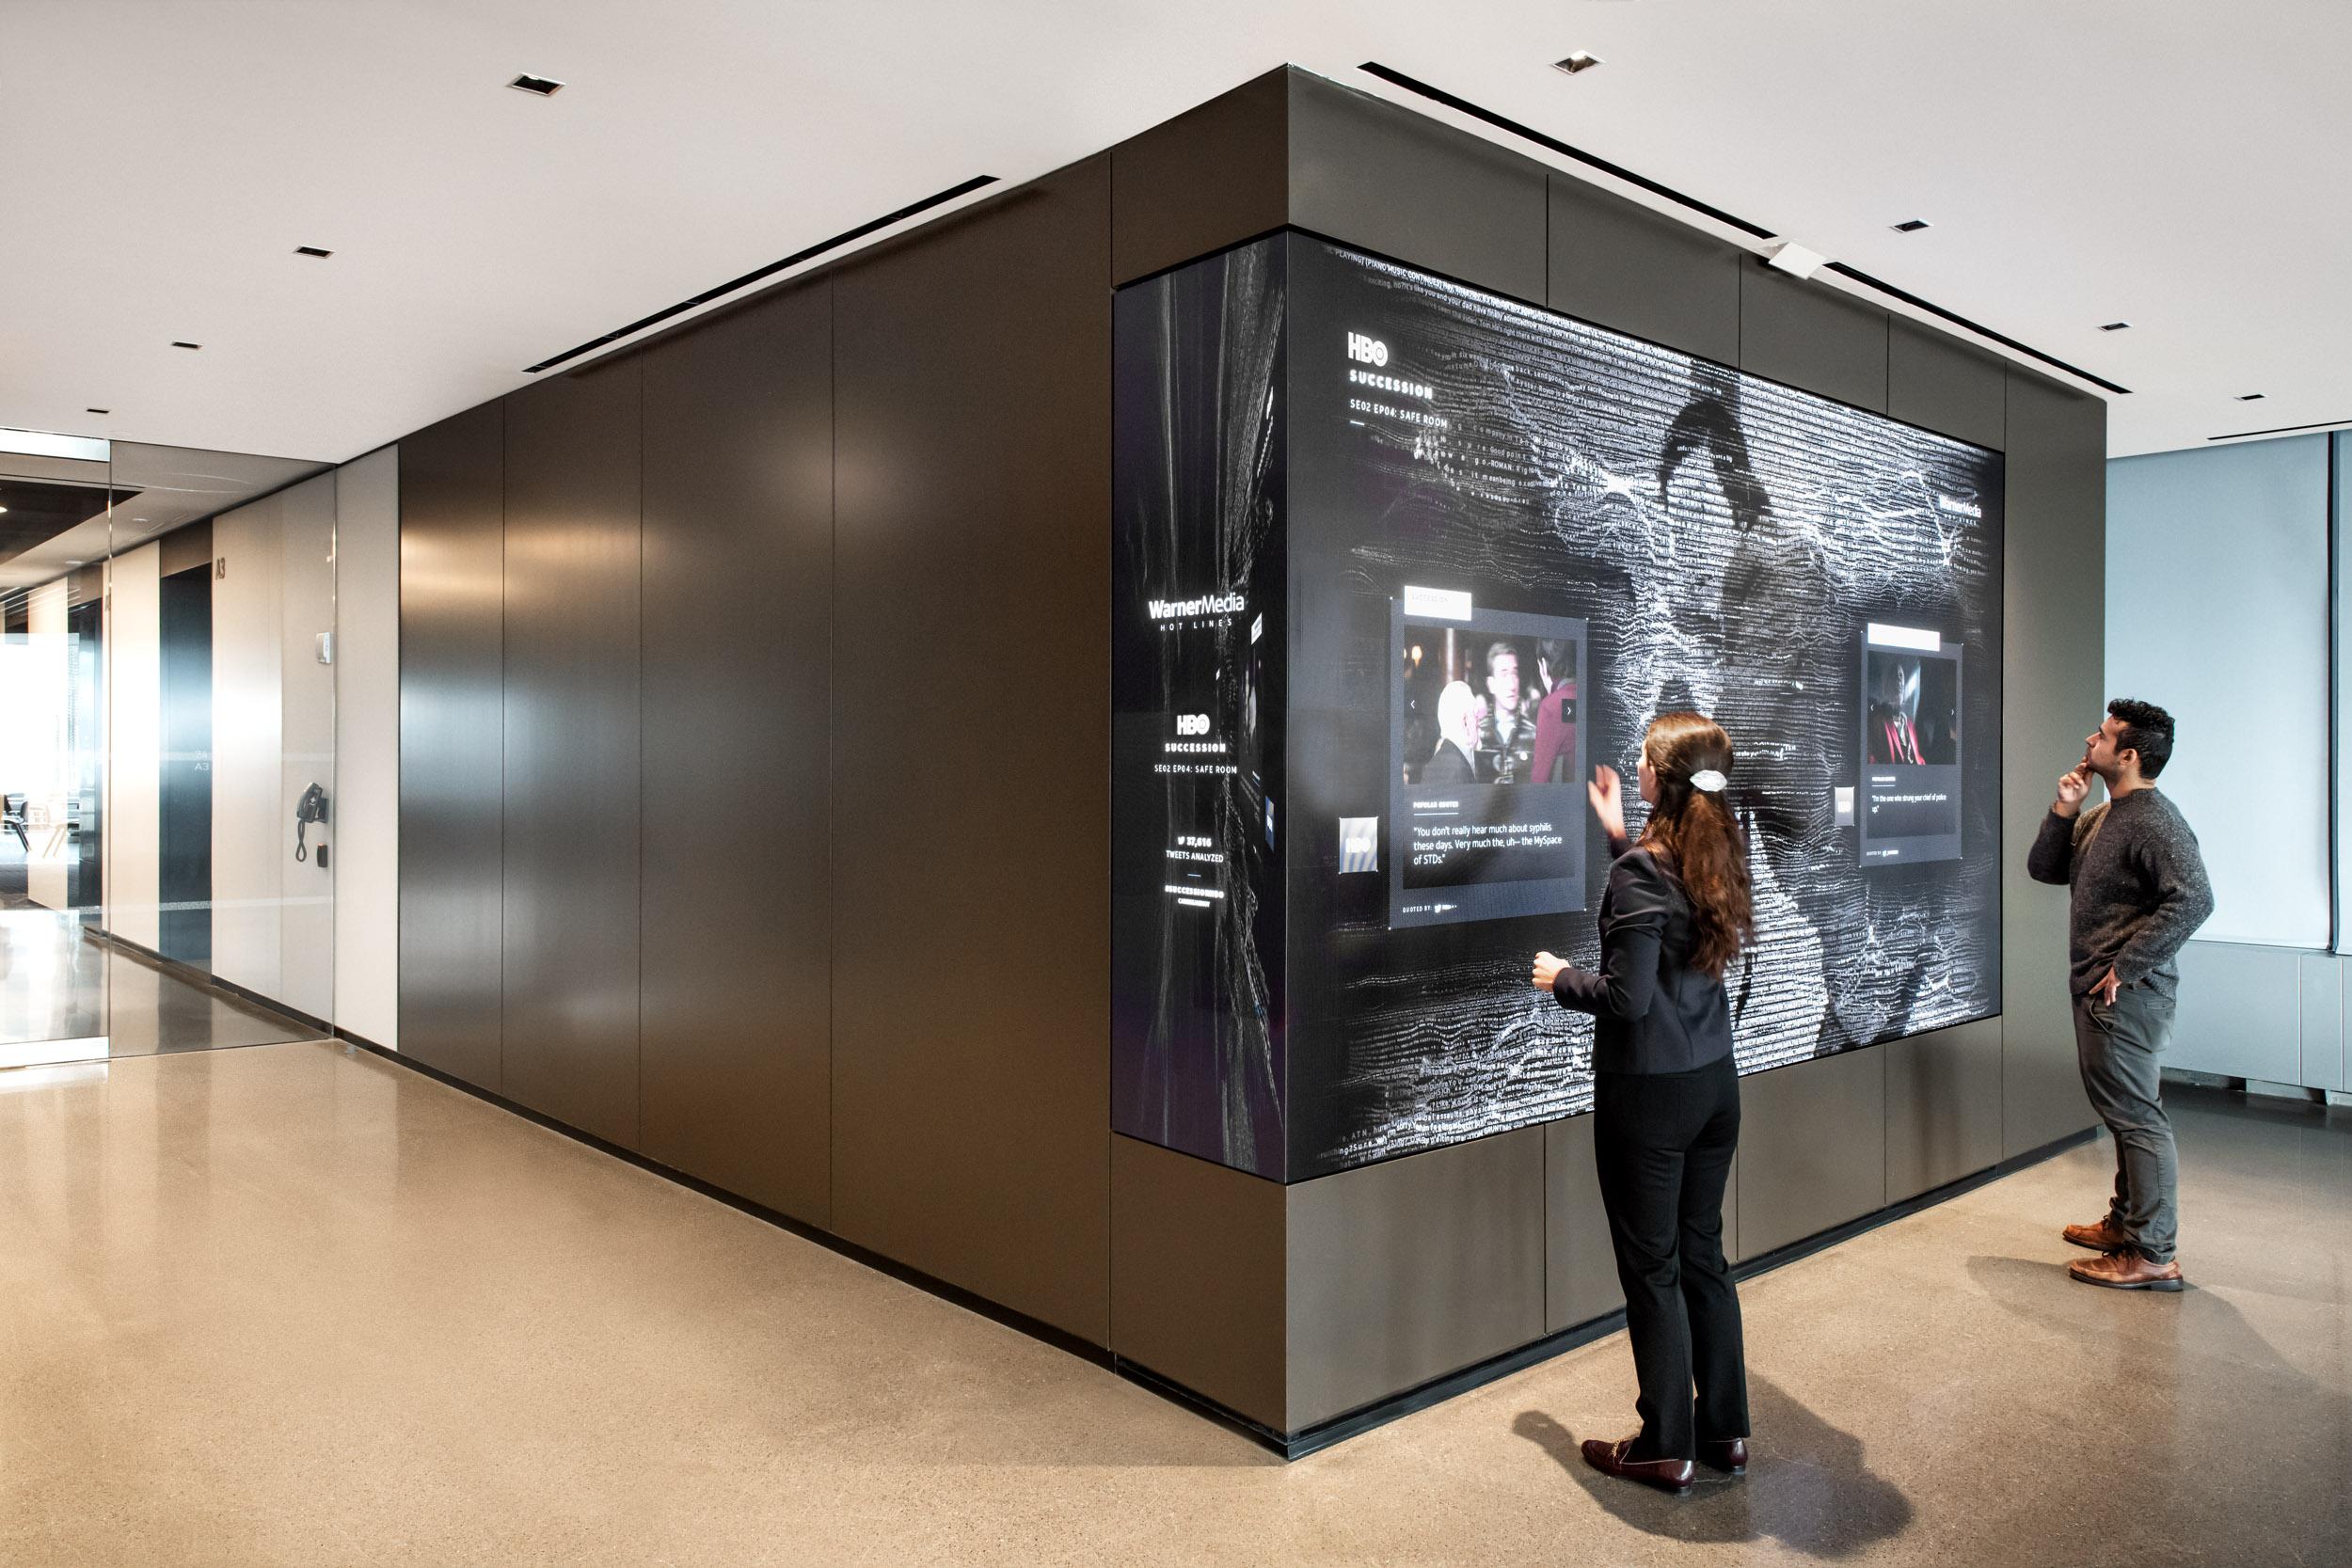 An interactive experience at WarnerMedia's Hudson Yards HQ by ESI Design (Photo credit: Keena Photo) | AVIXA